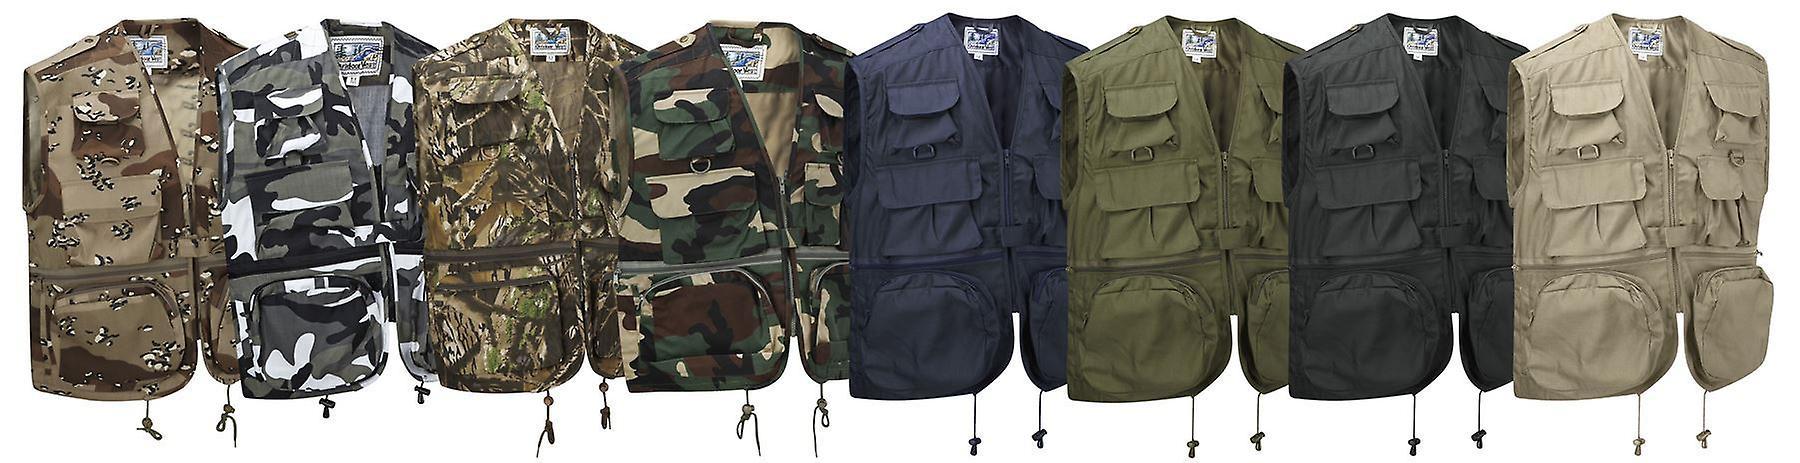 Multi Pocket Fishing Vest Hunting Waistcoat